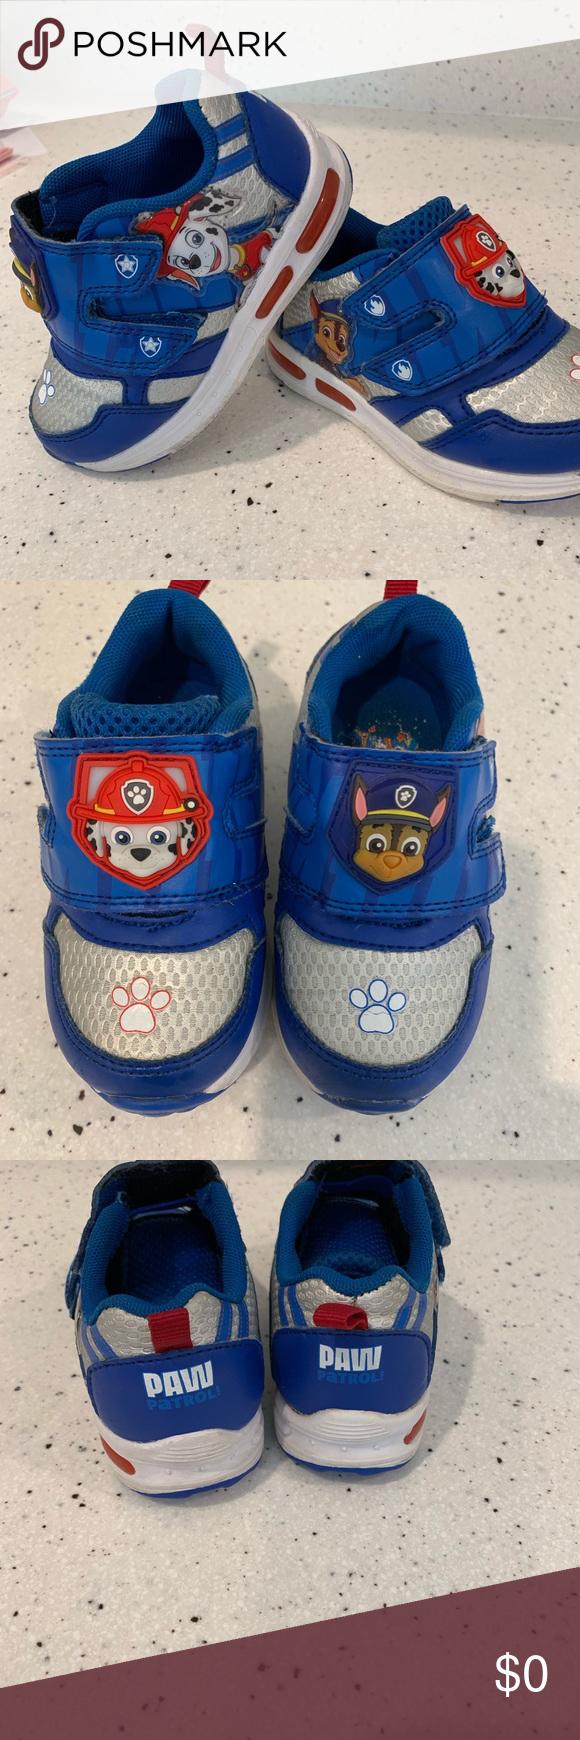 Velcro shoes, Paw patrol shoes, Strap shoes